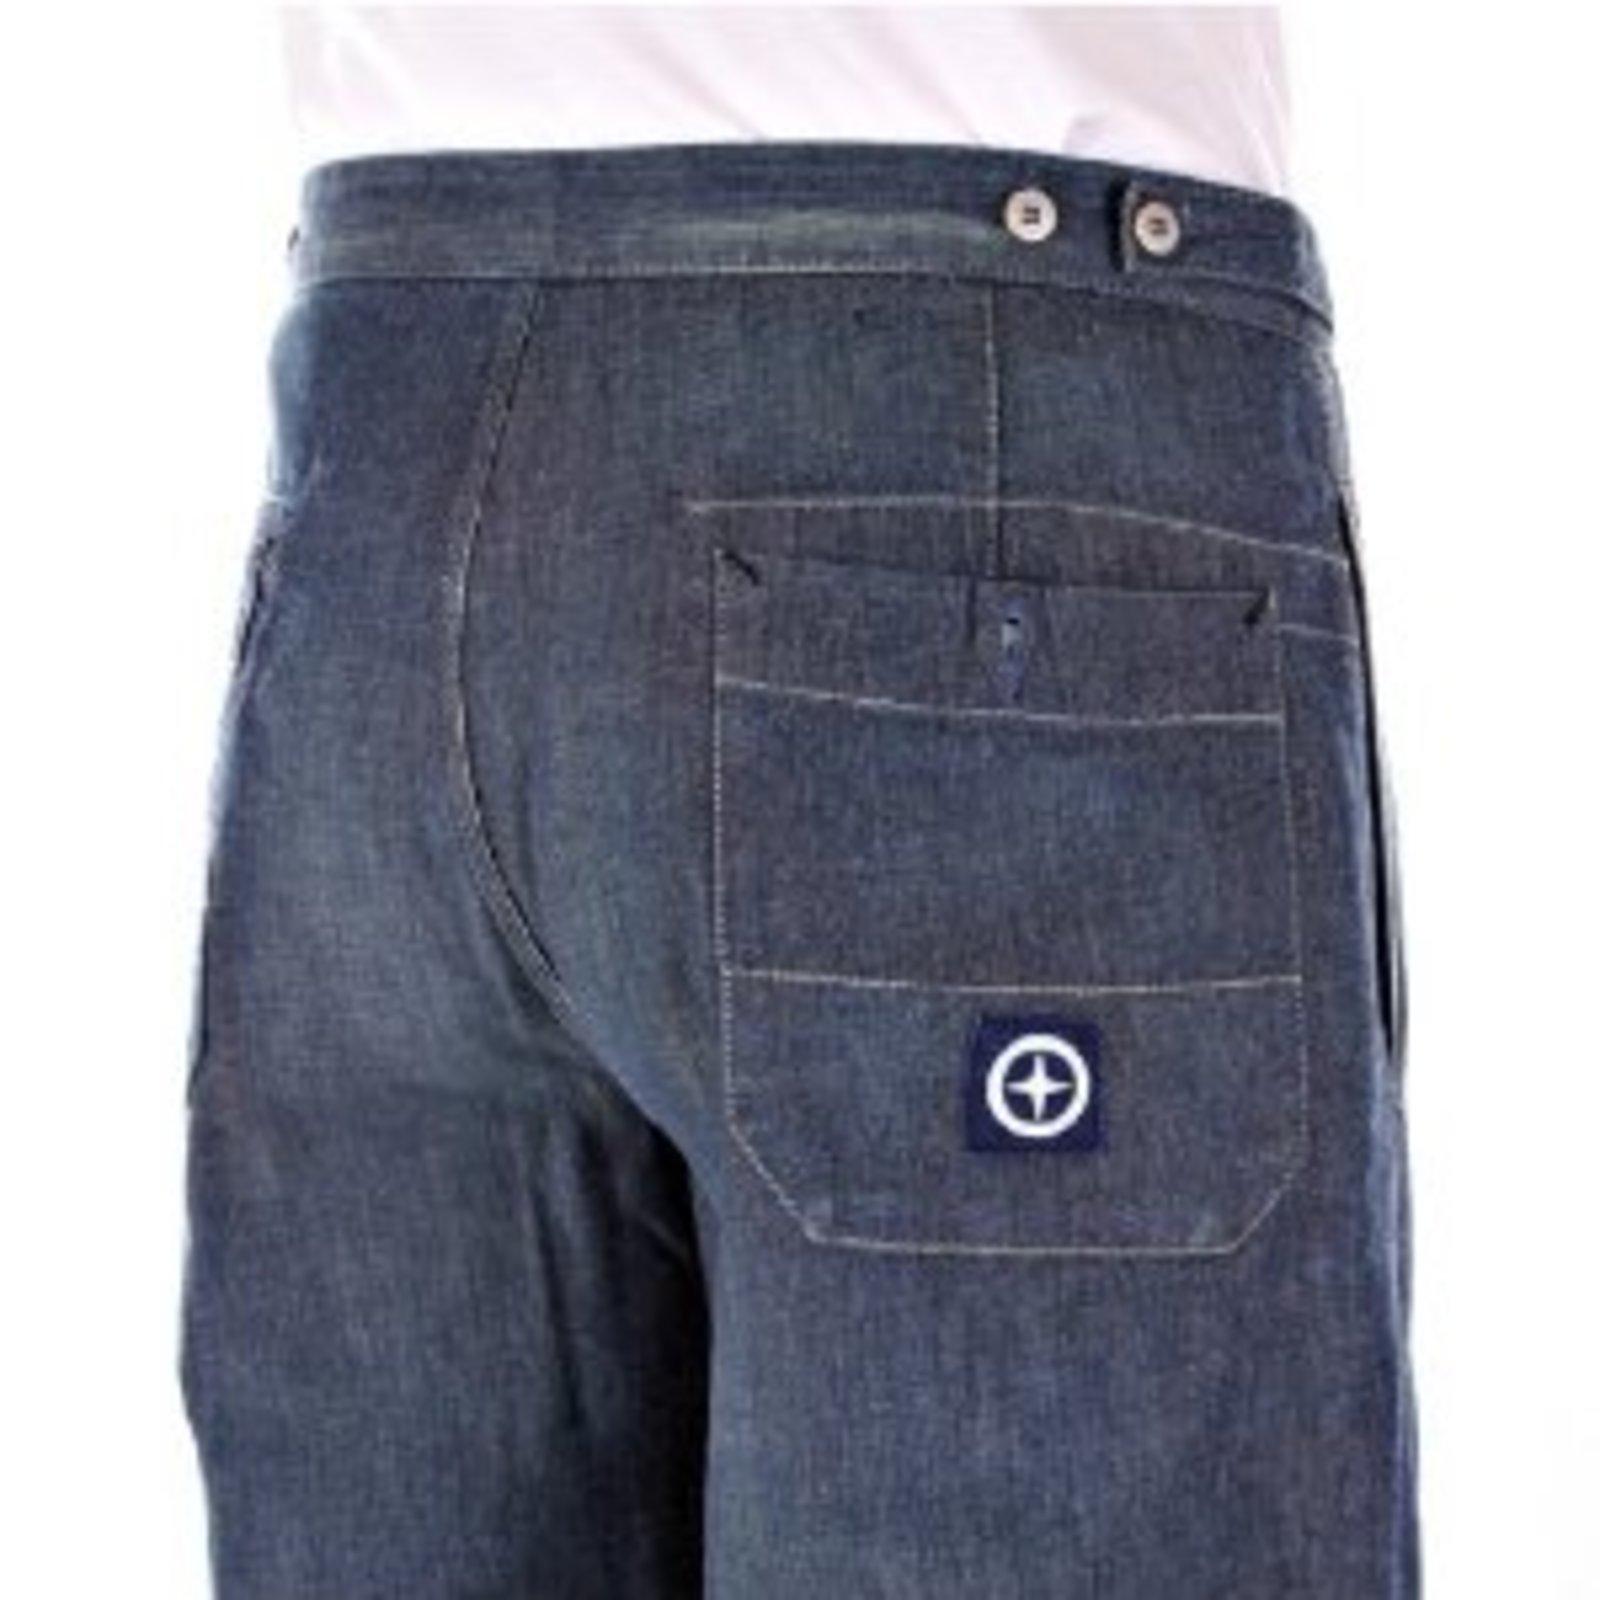 stone island jeans regular fit denim jean at togged clothing. Black Bedroom Furniture Sets. Home Design Ideas